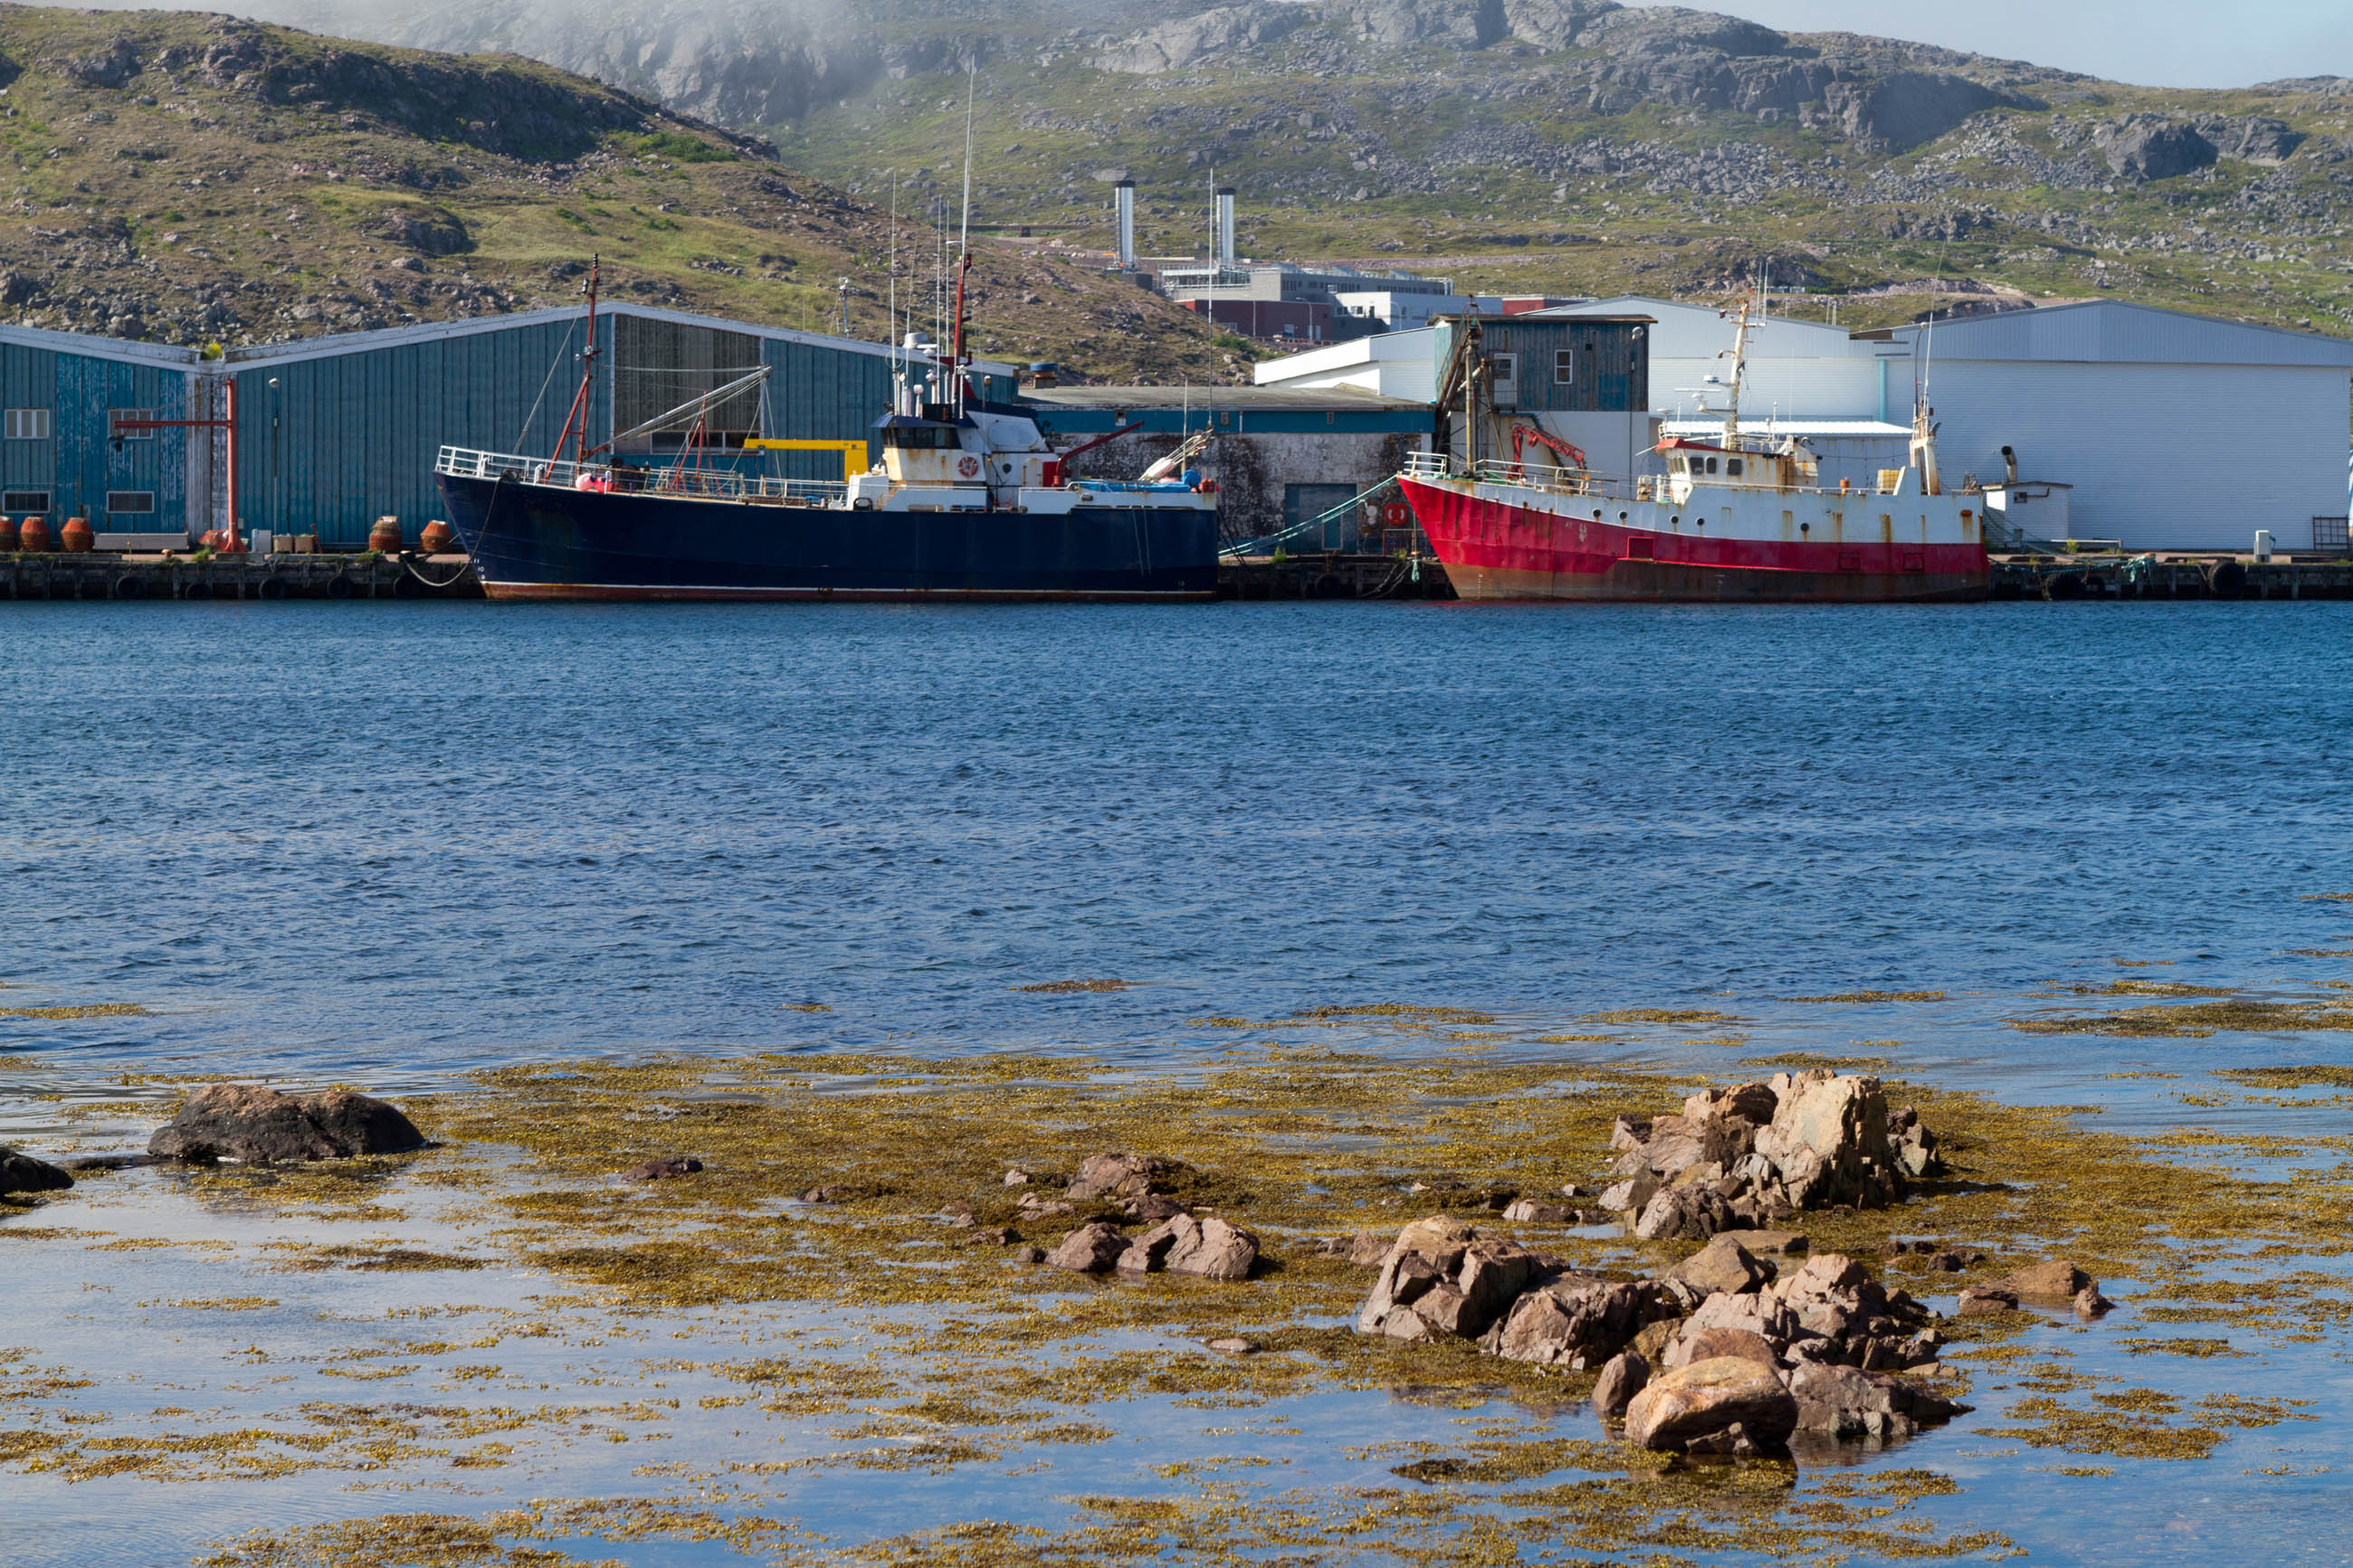 Fishing Boats, America, Islands, Ships, Saint, HQ Photo